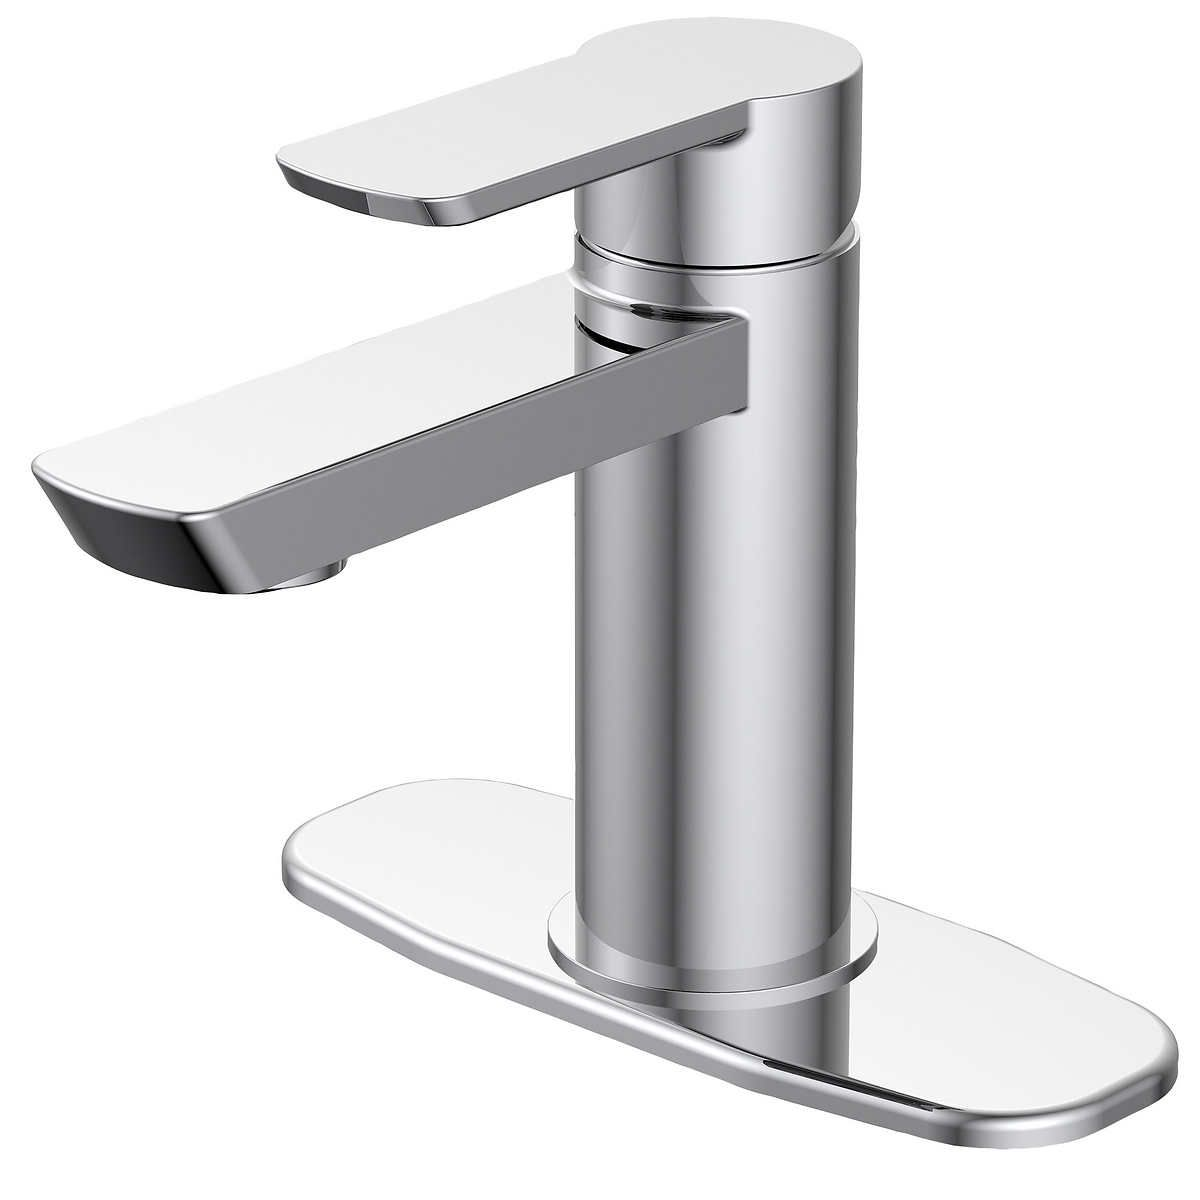 Pin By Ottawa Deafgirl Design On Bath Faucet Lavatory Faucet